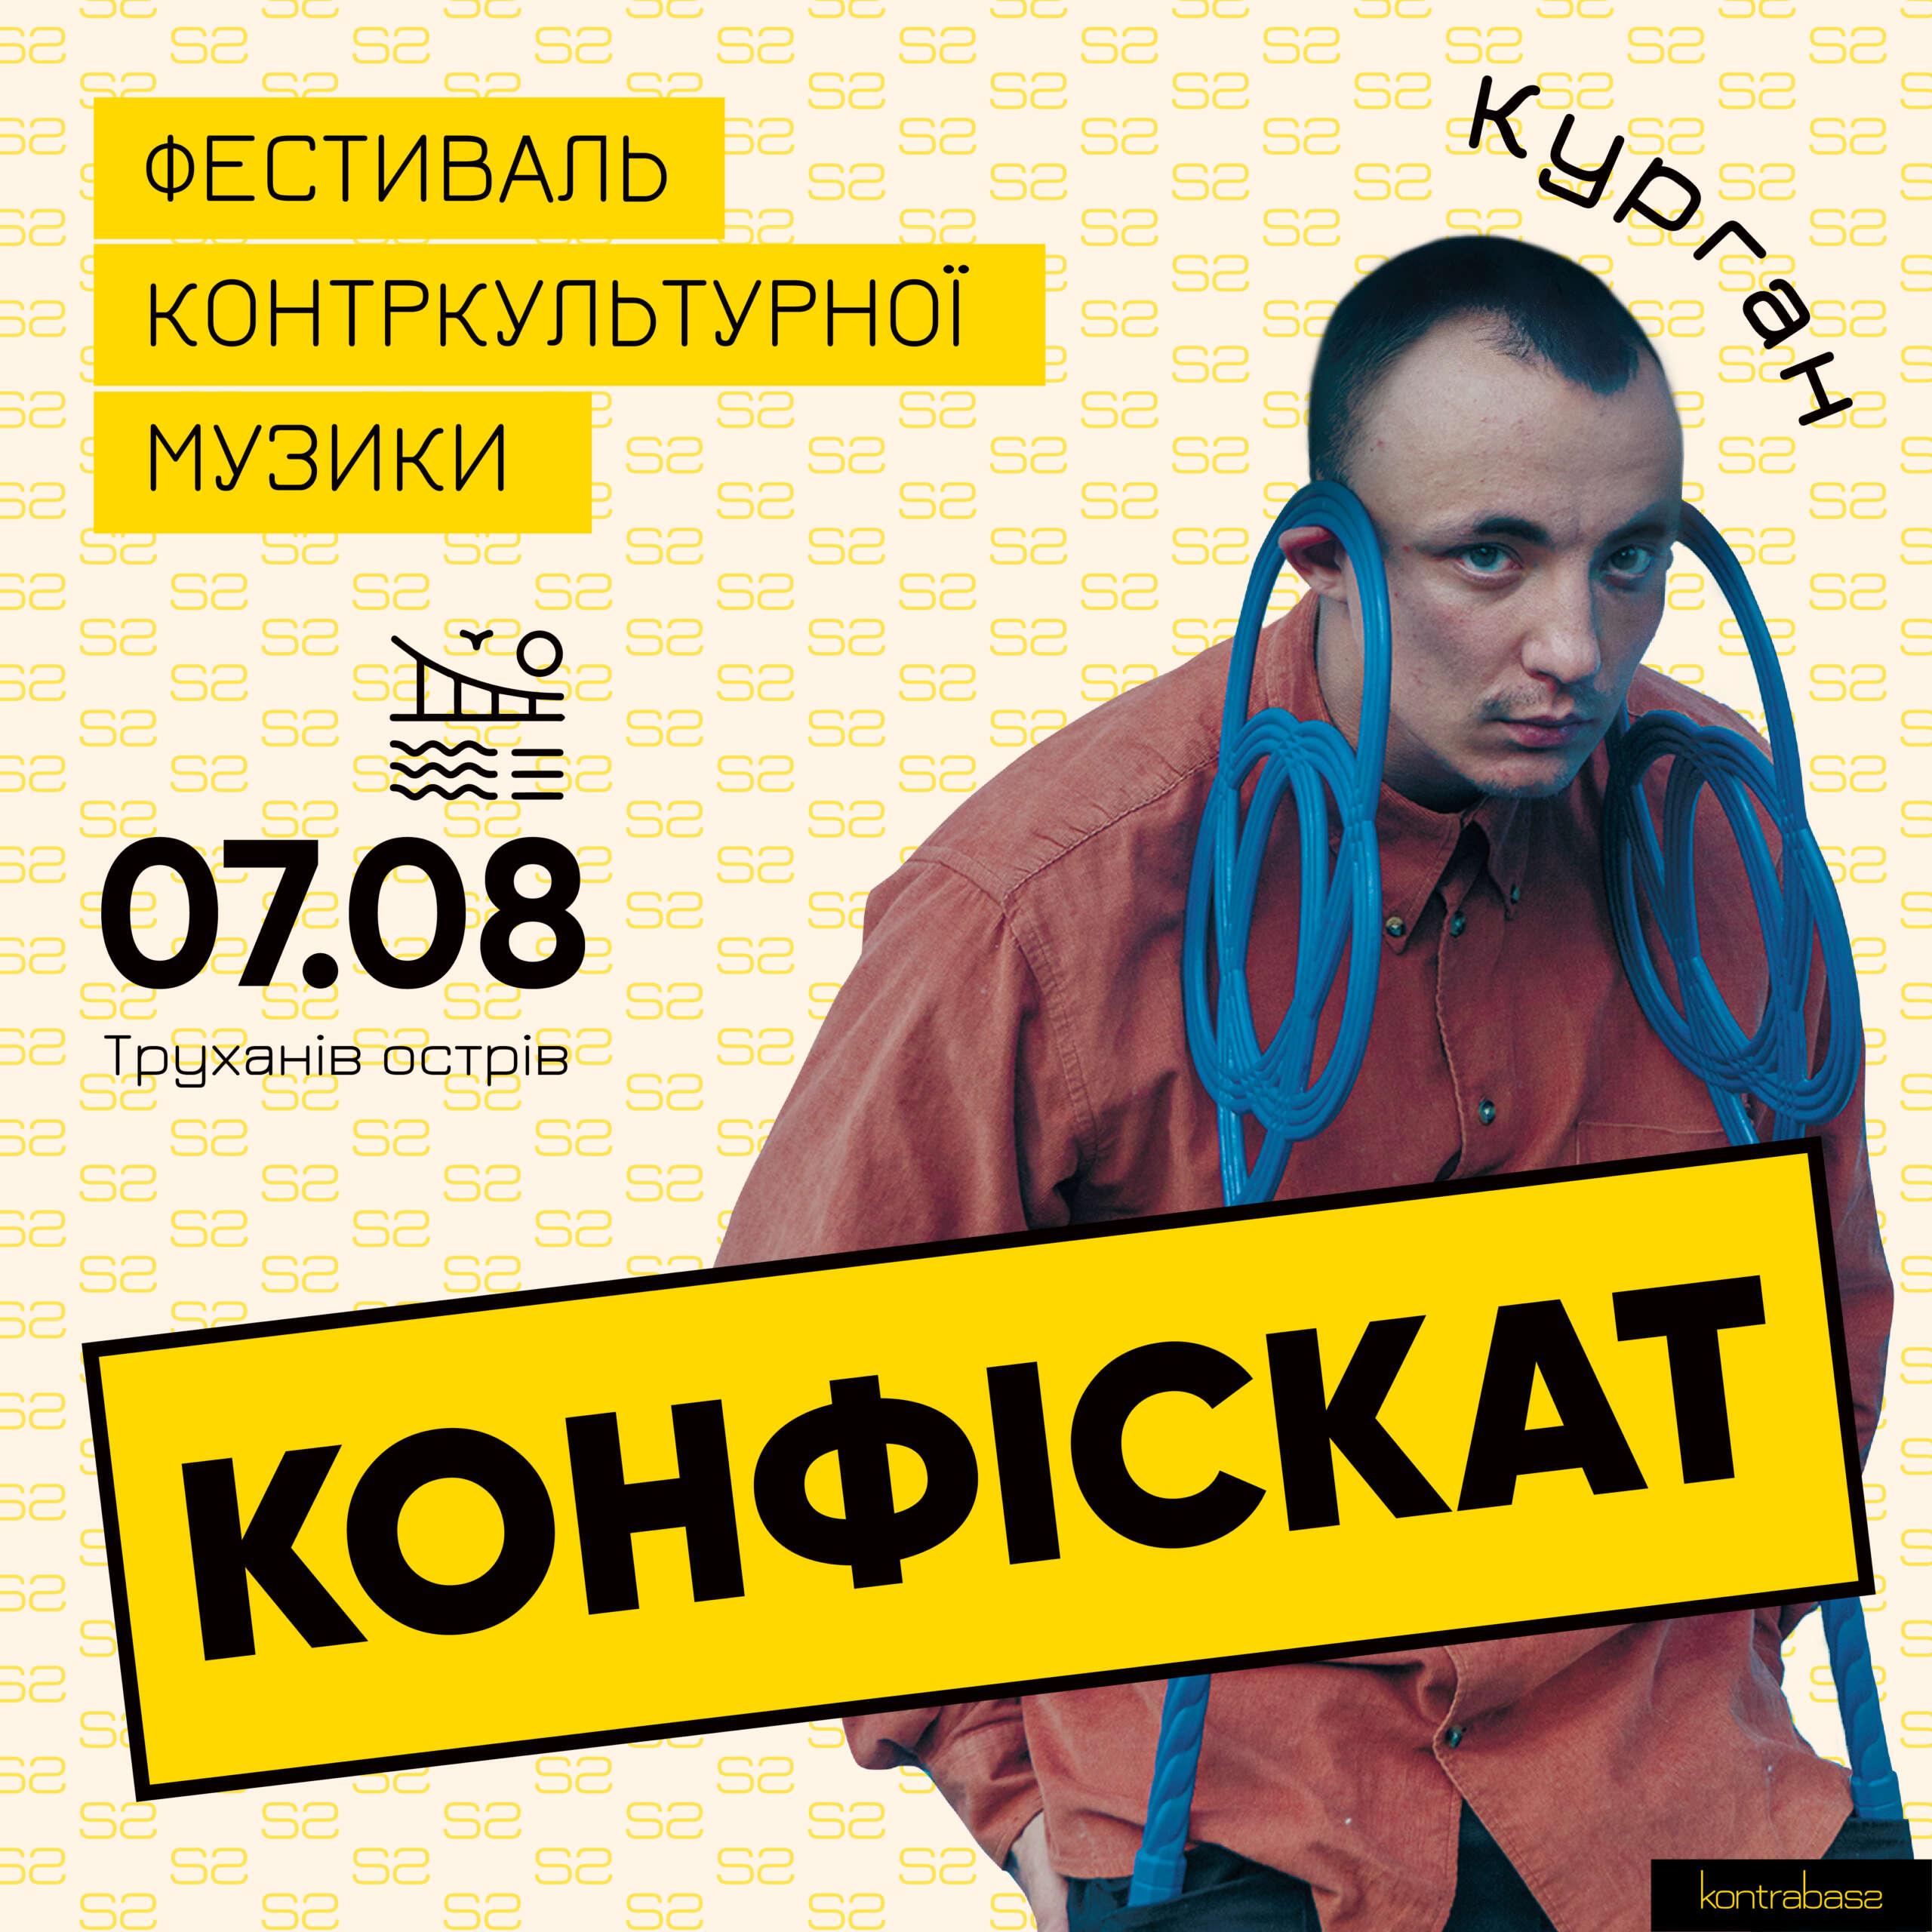 konfiskat-dtf-magazine2